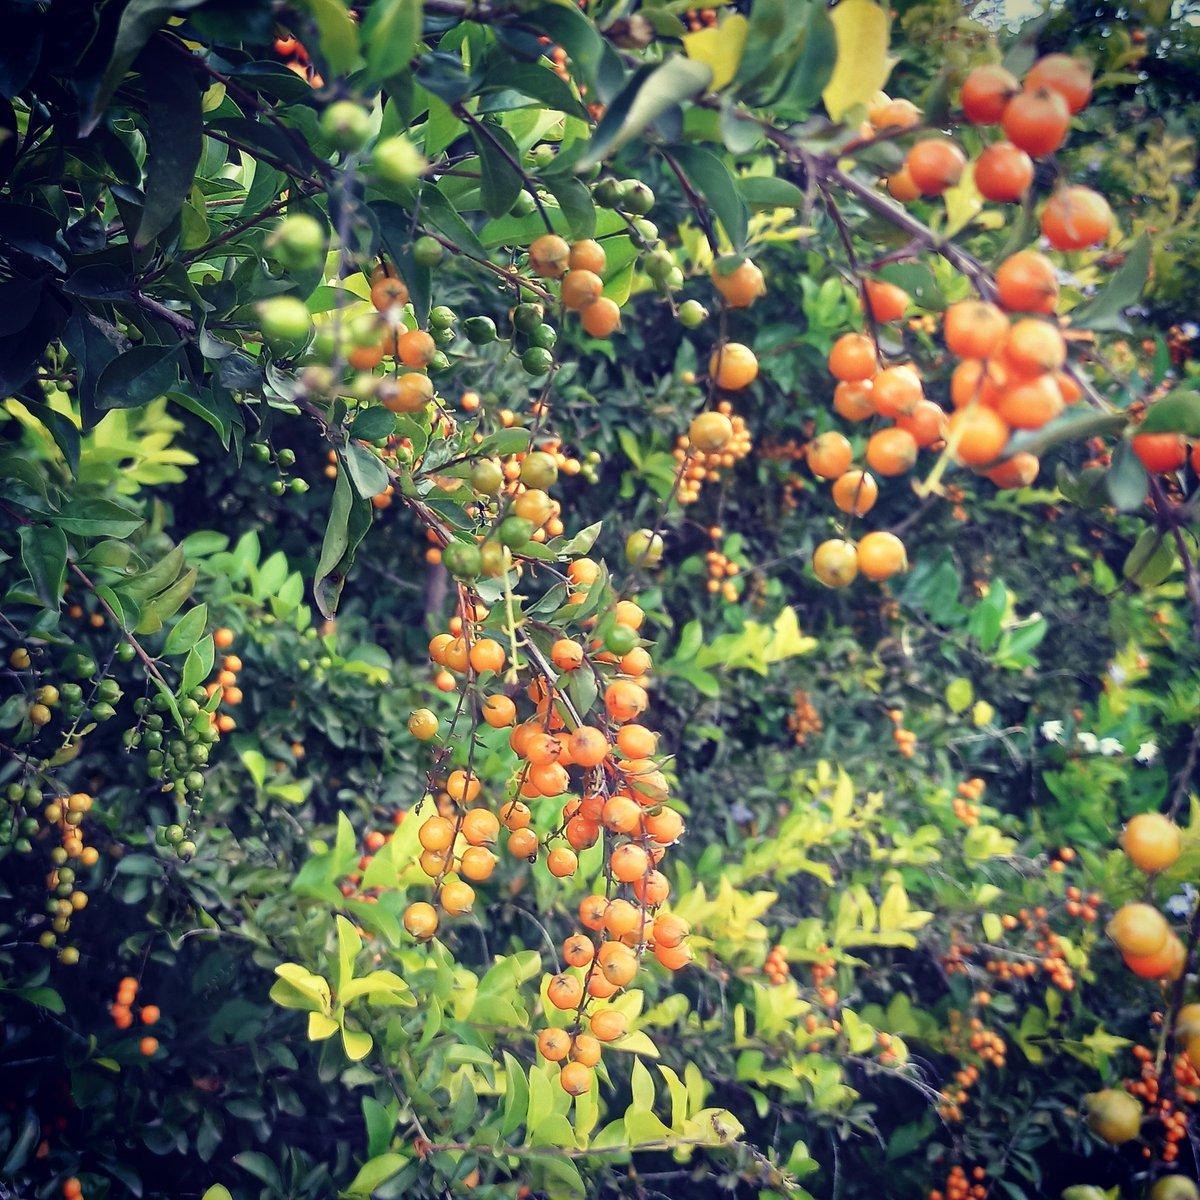 Orange glow #orange #orangeberry #berries #berry #berrypicking #orangeisthenewblack #naturephotograpy #color #colors #beautiful #green #leaves  #photooftheday #photographylovers #photo #travelphotography #astorytotellindia #tuesdaymoodpic.twitter.com/EbqHwgeaMZ